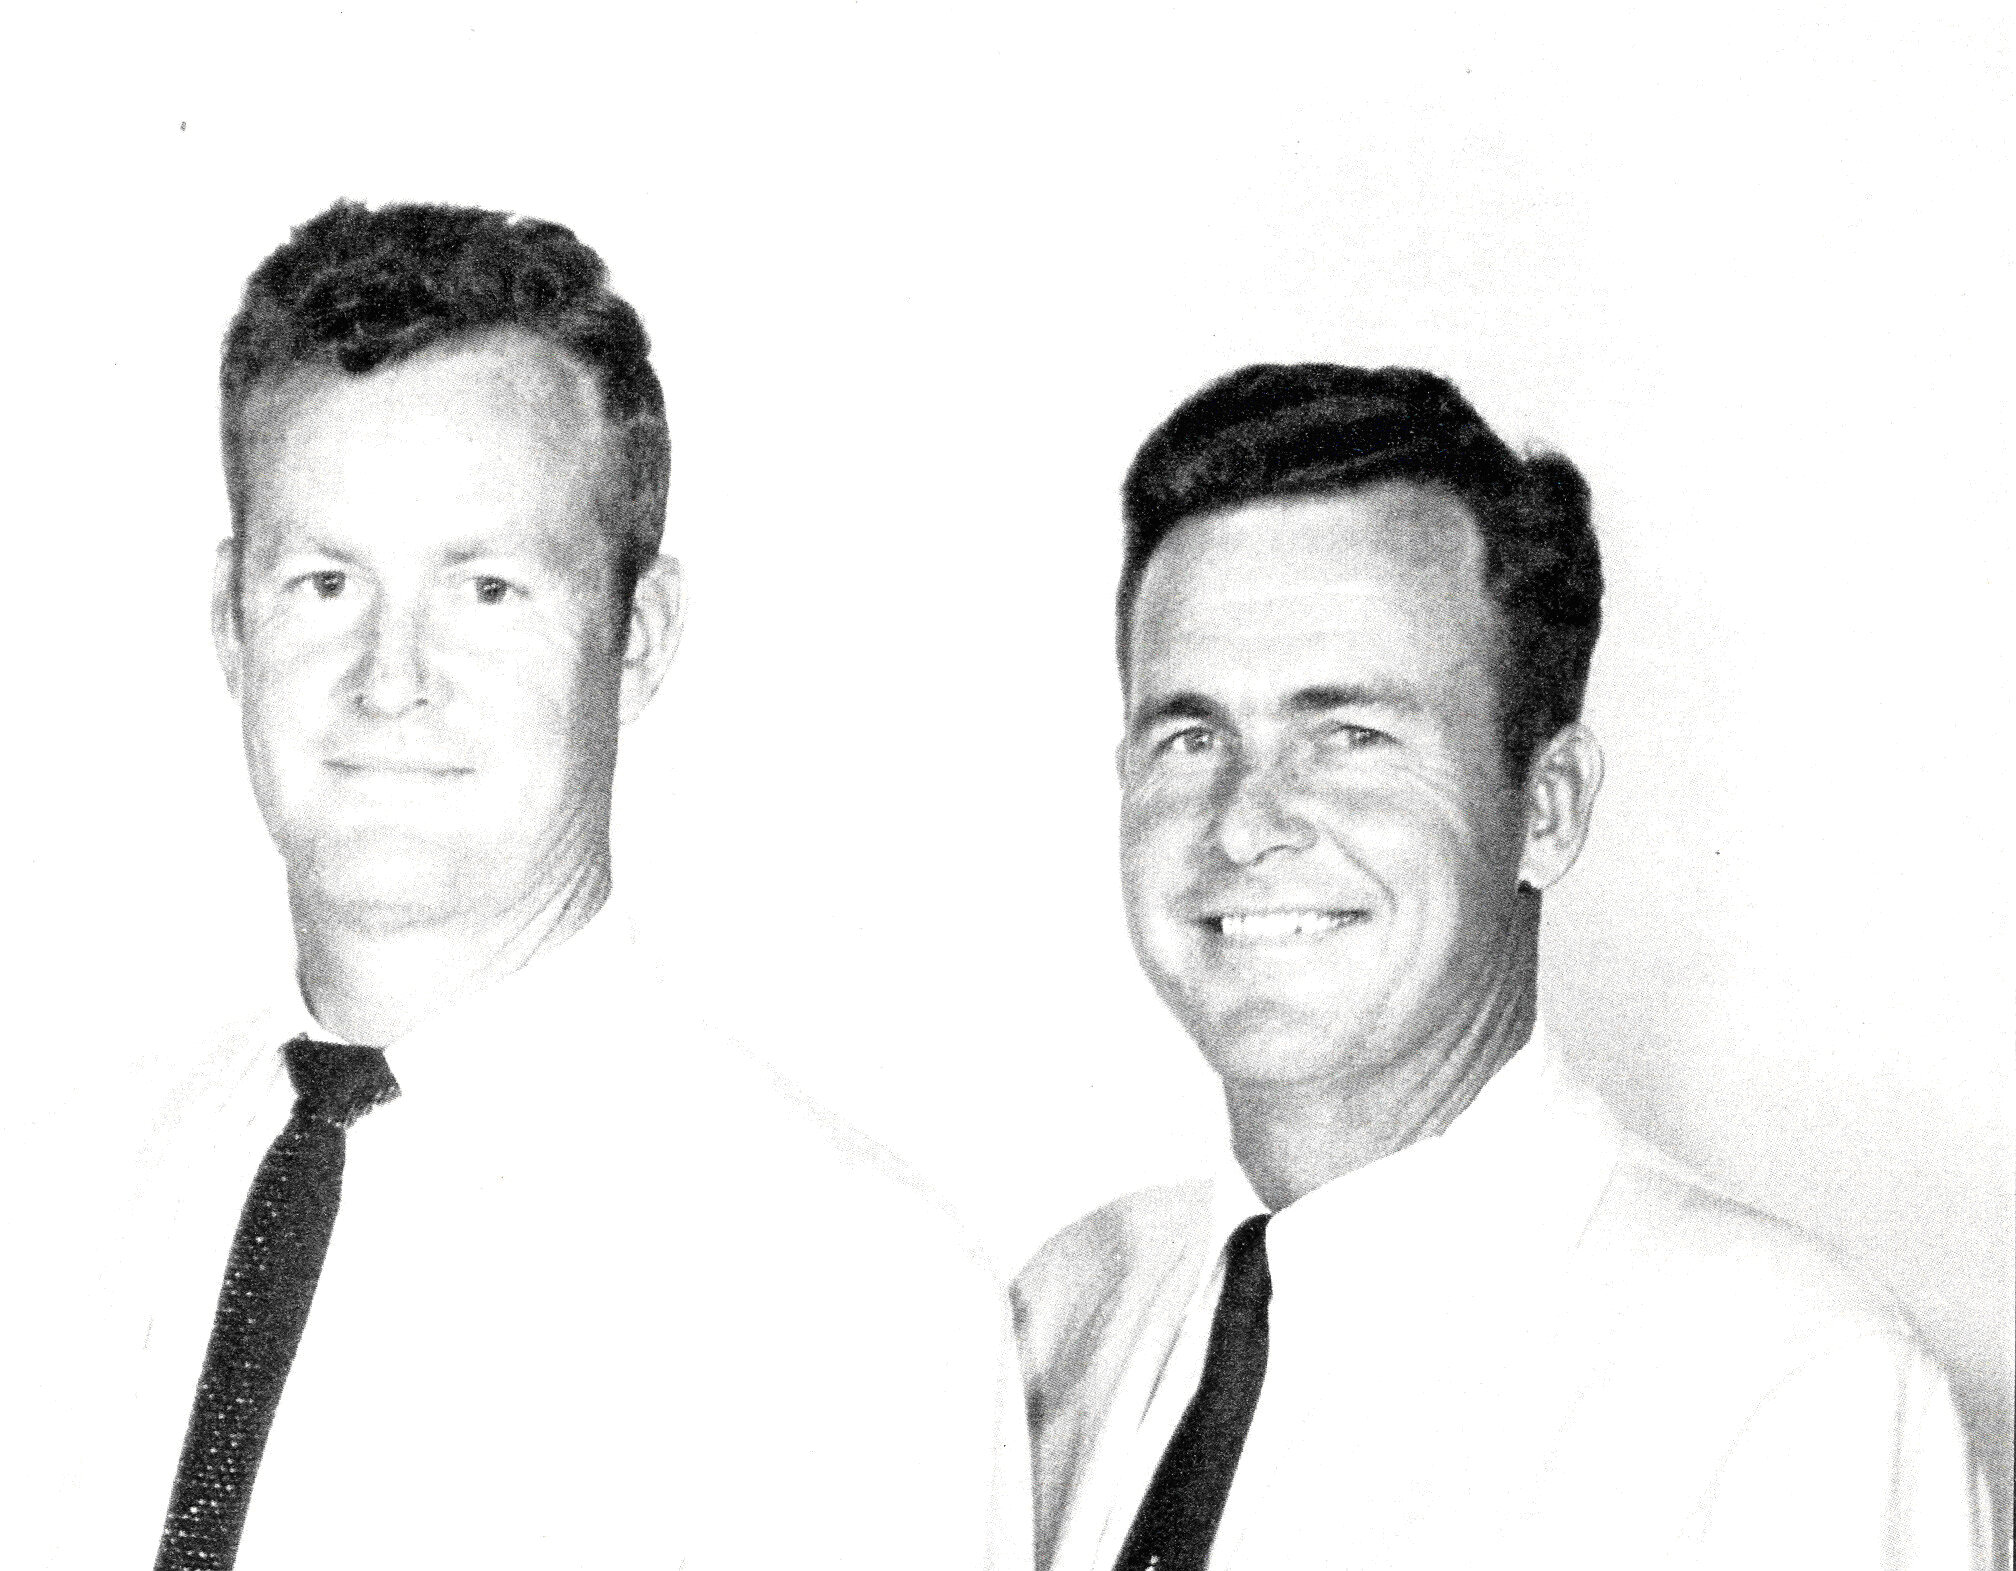 Coolidge and Leslie Sandy